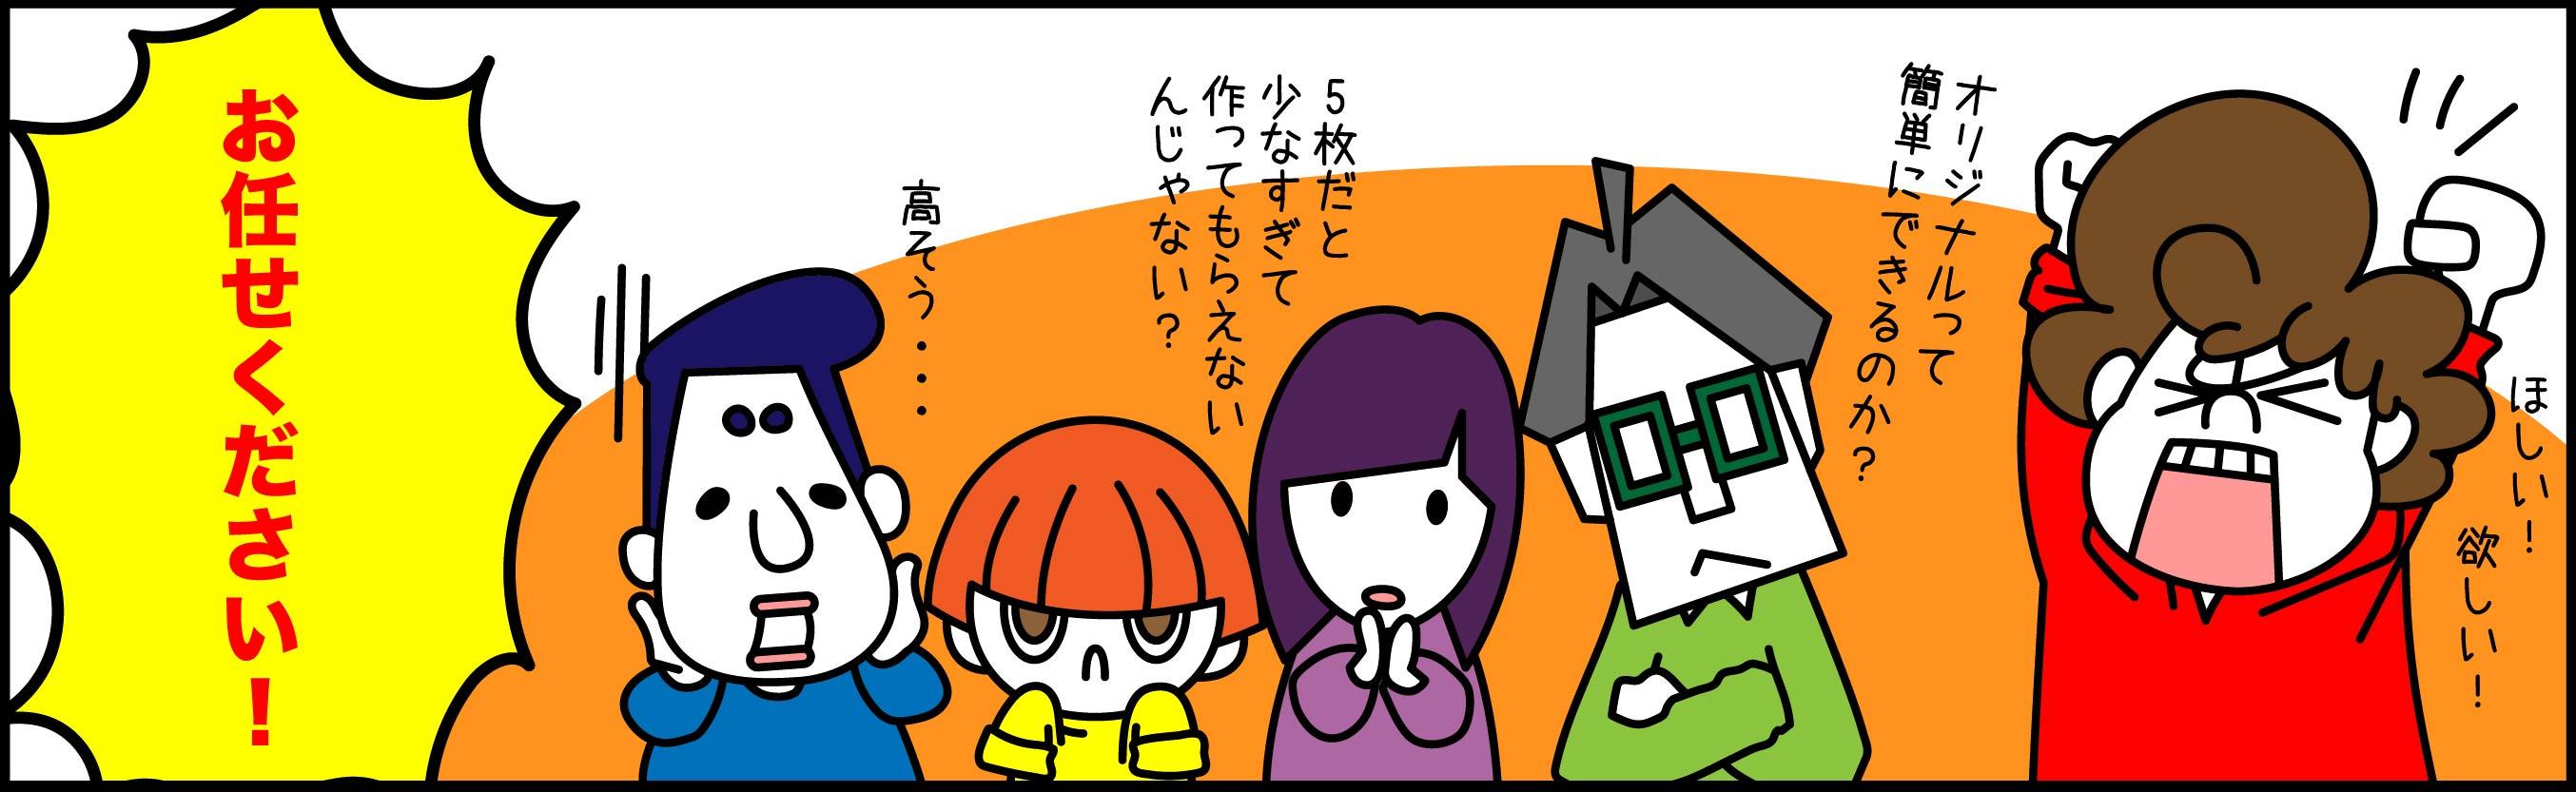 HP漫画2-02